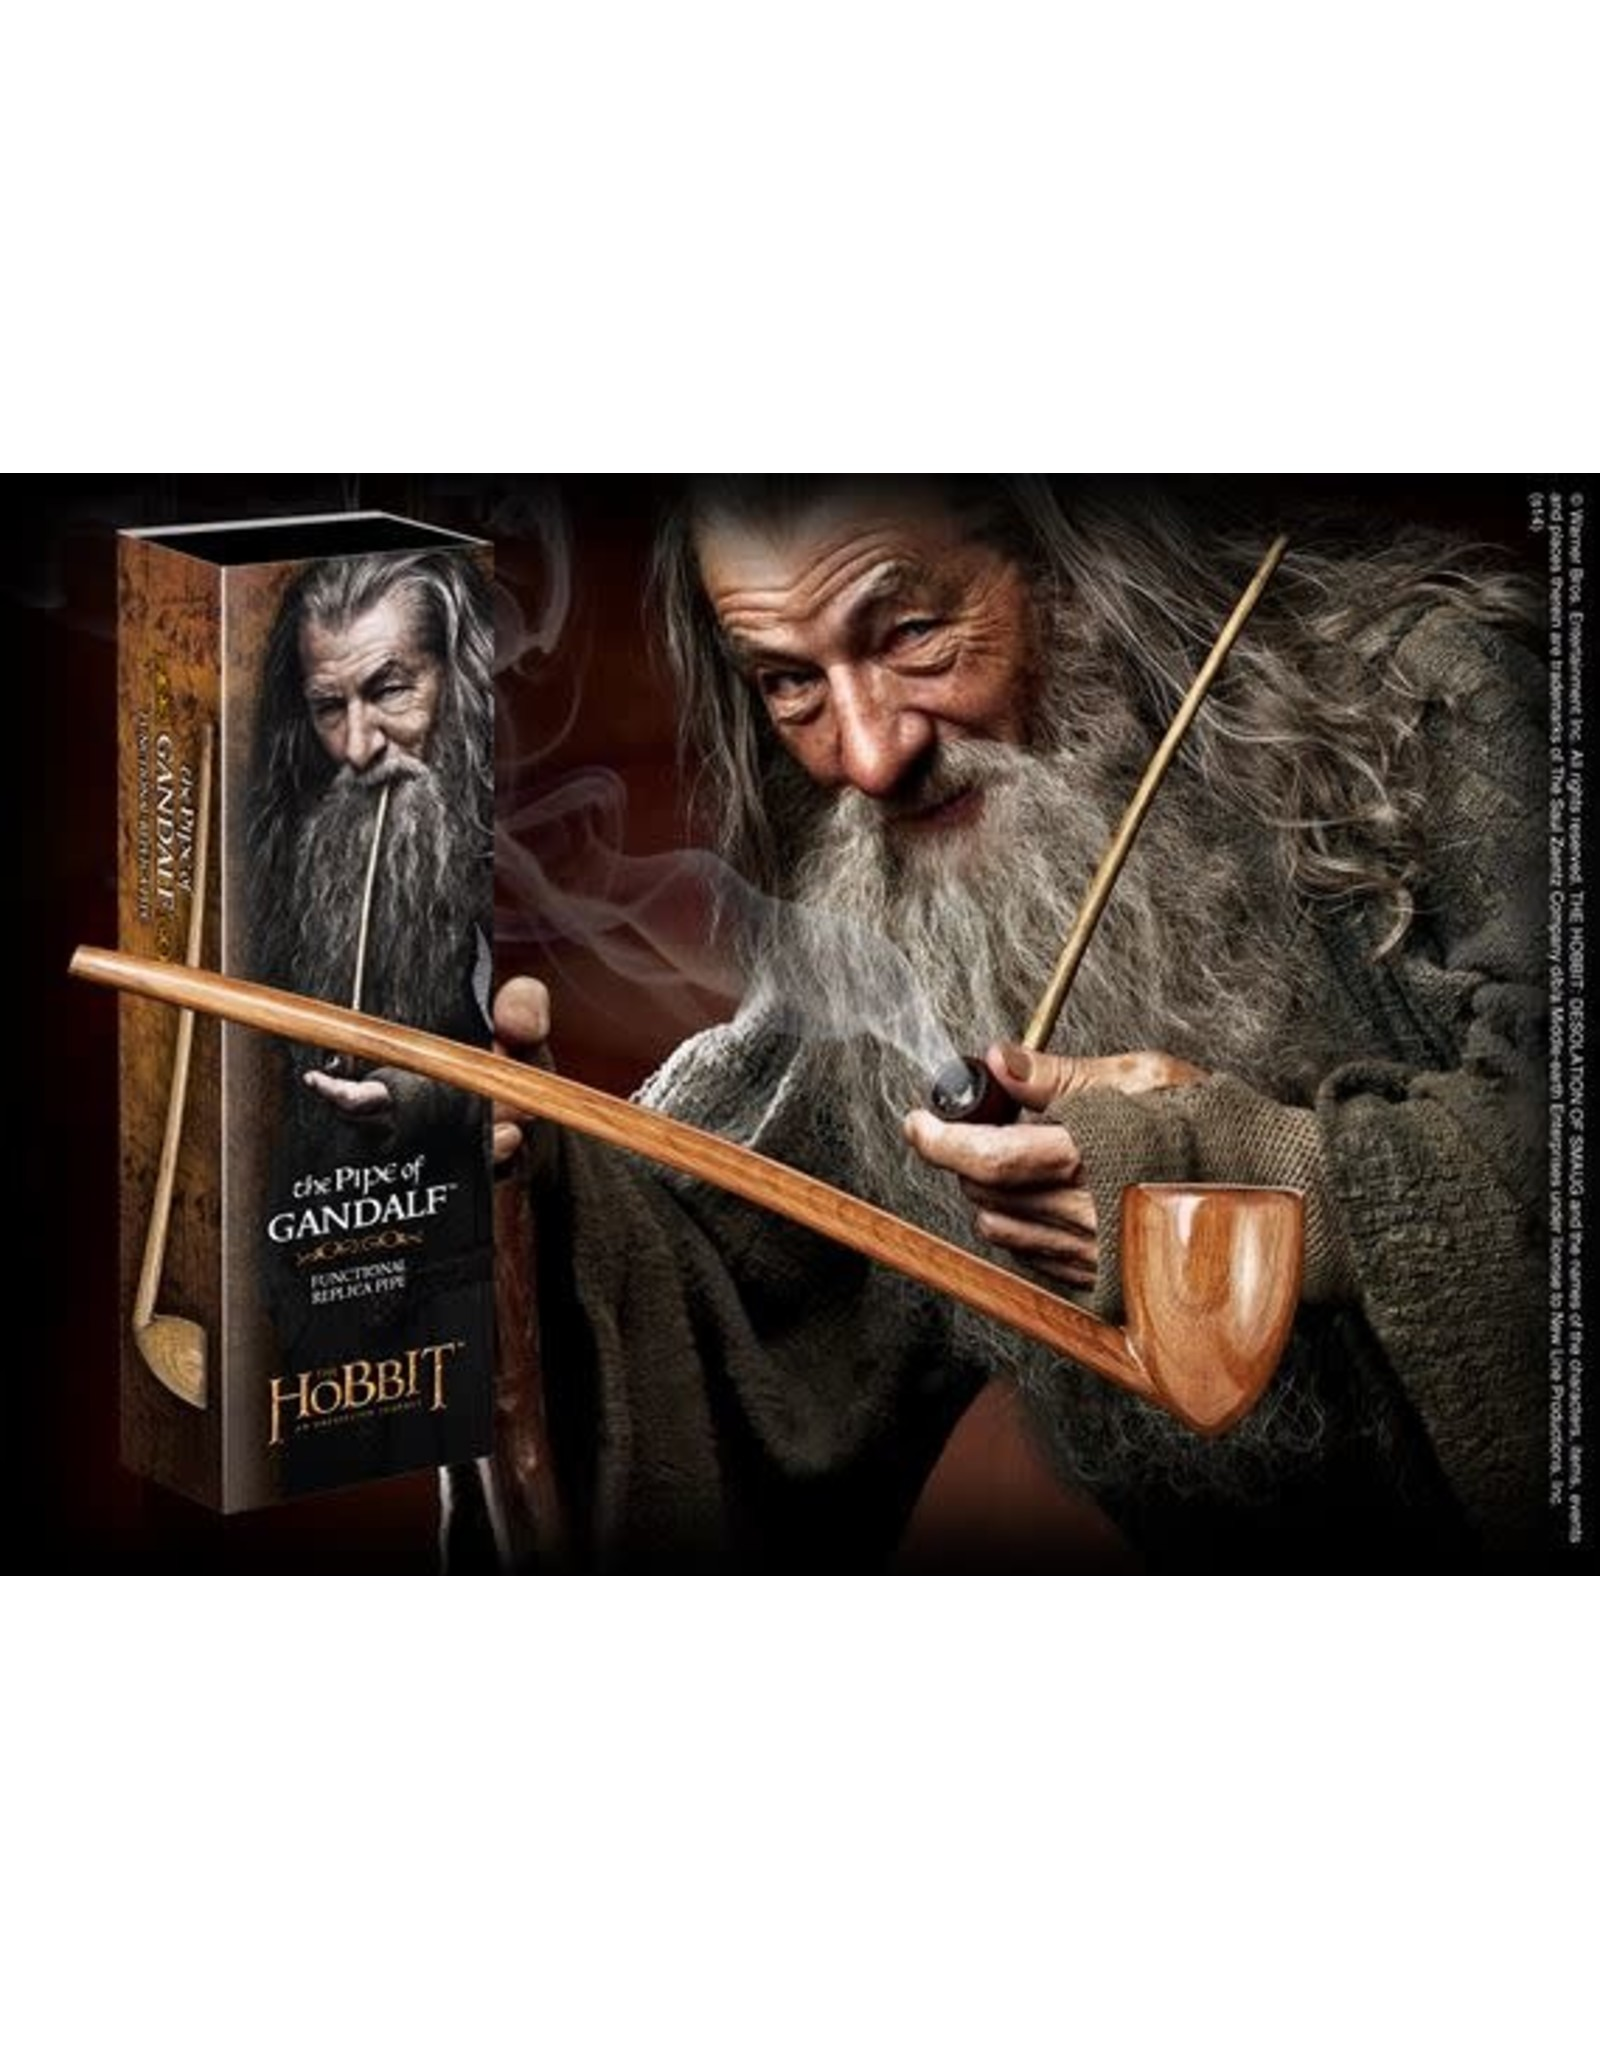 THE HOBBIT - Gandalf's Pipe